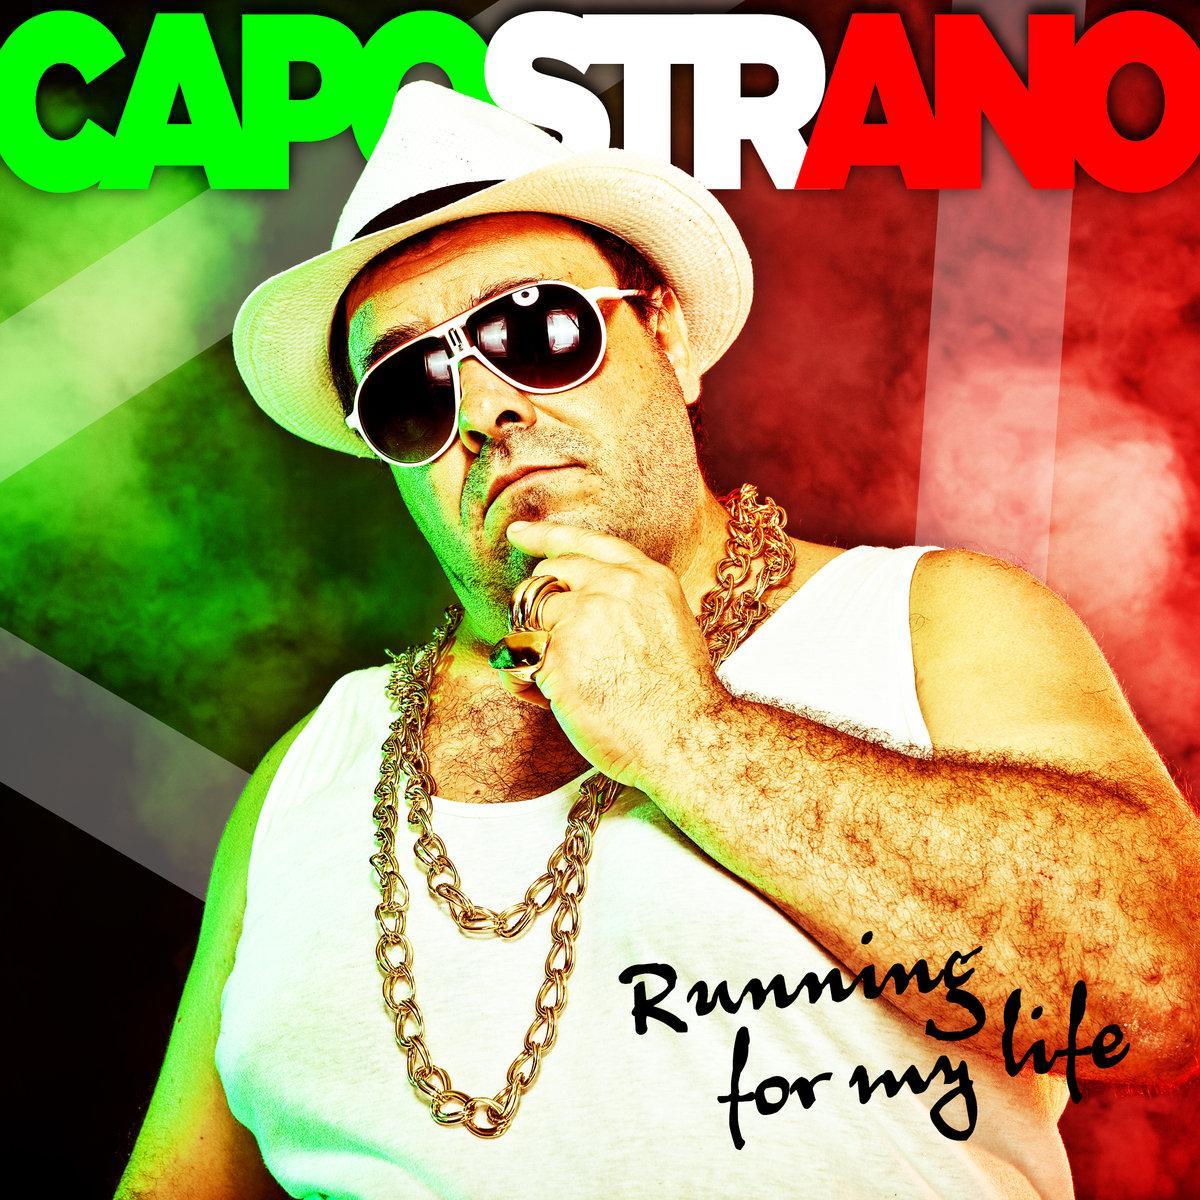 Capostrano - Running For My Life